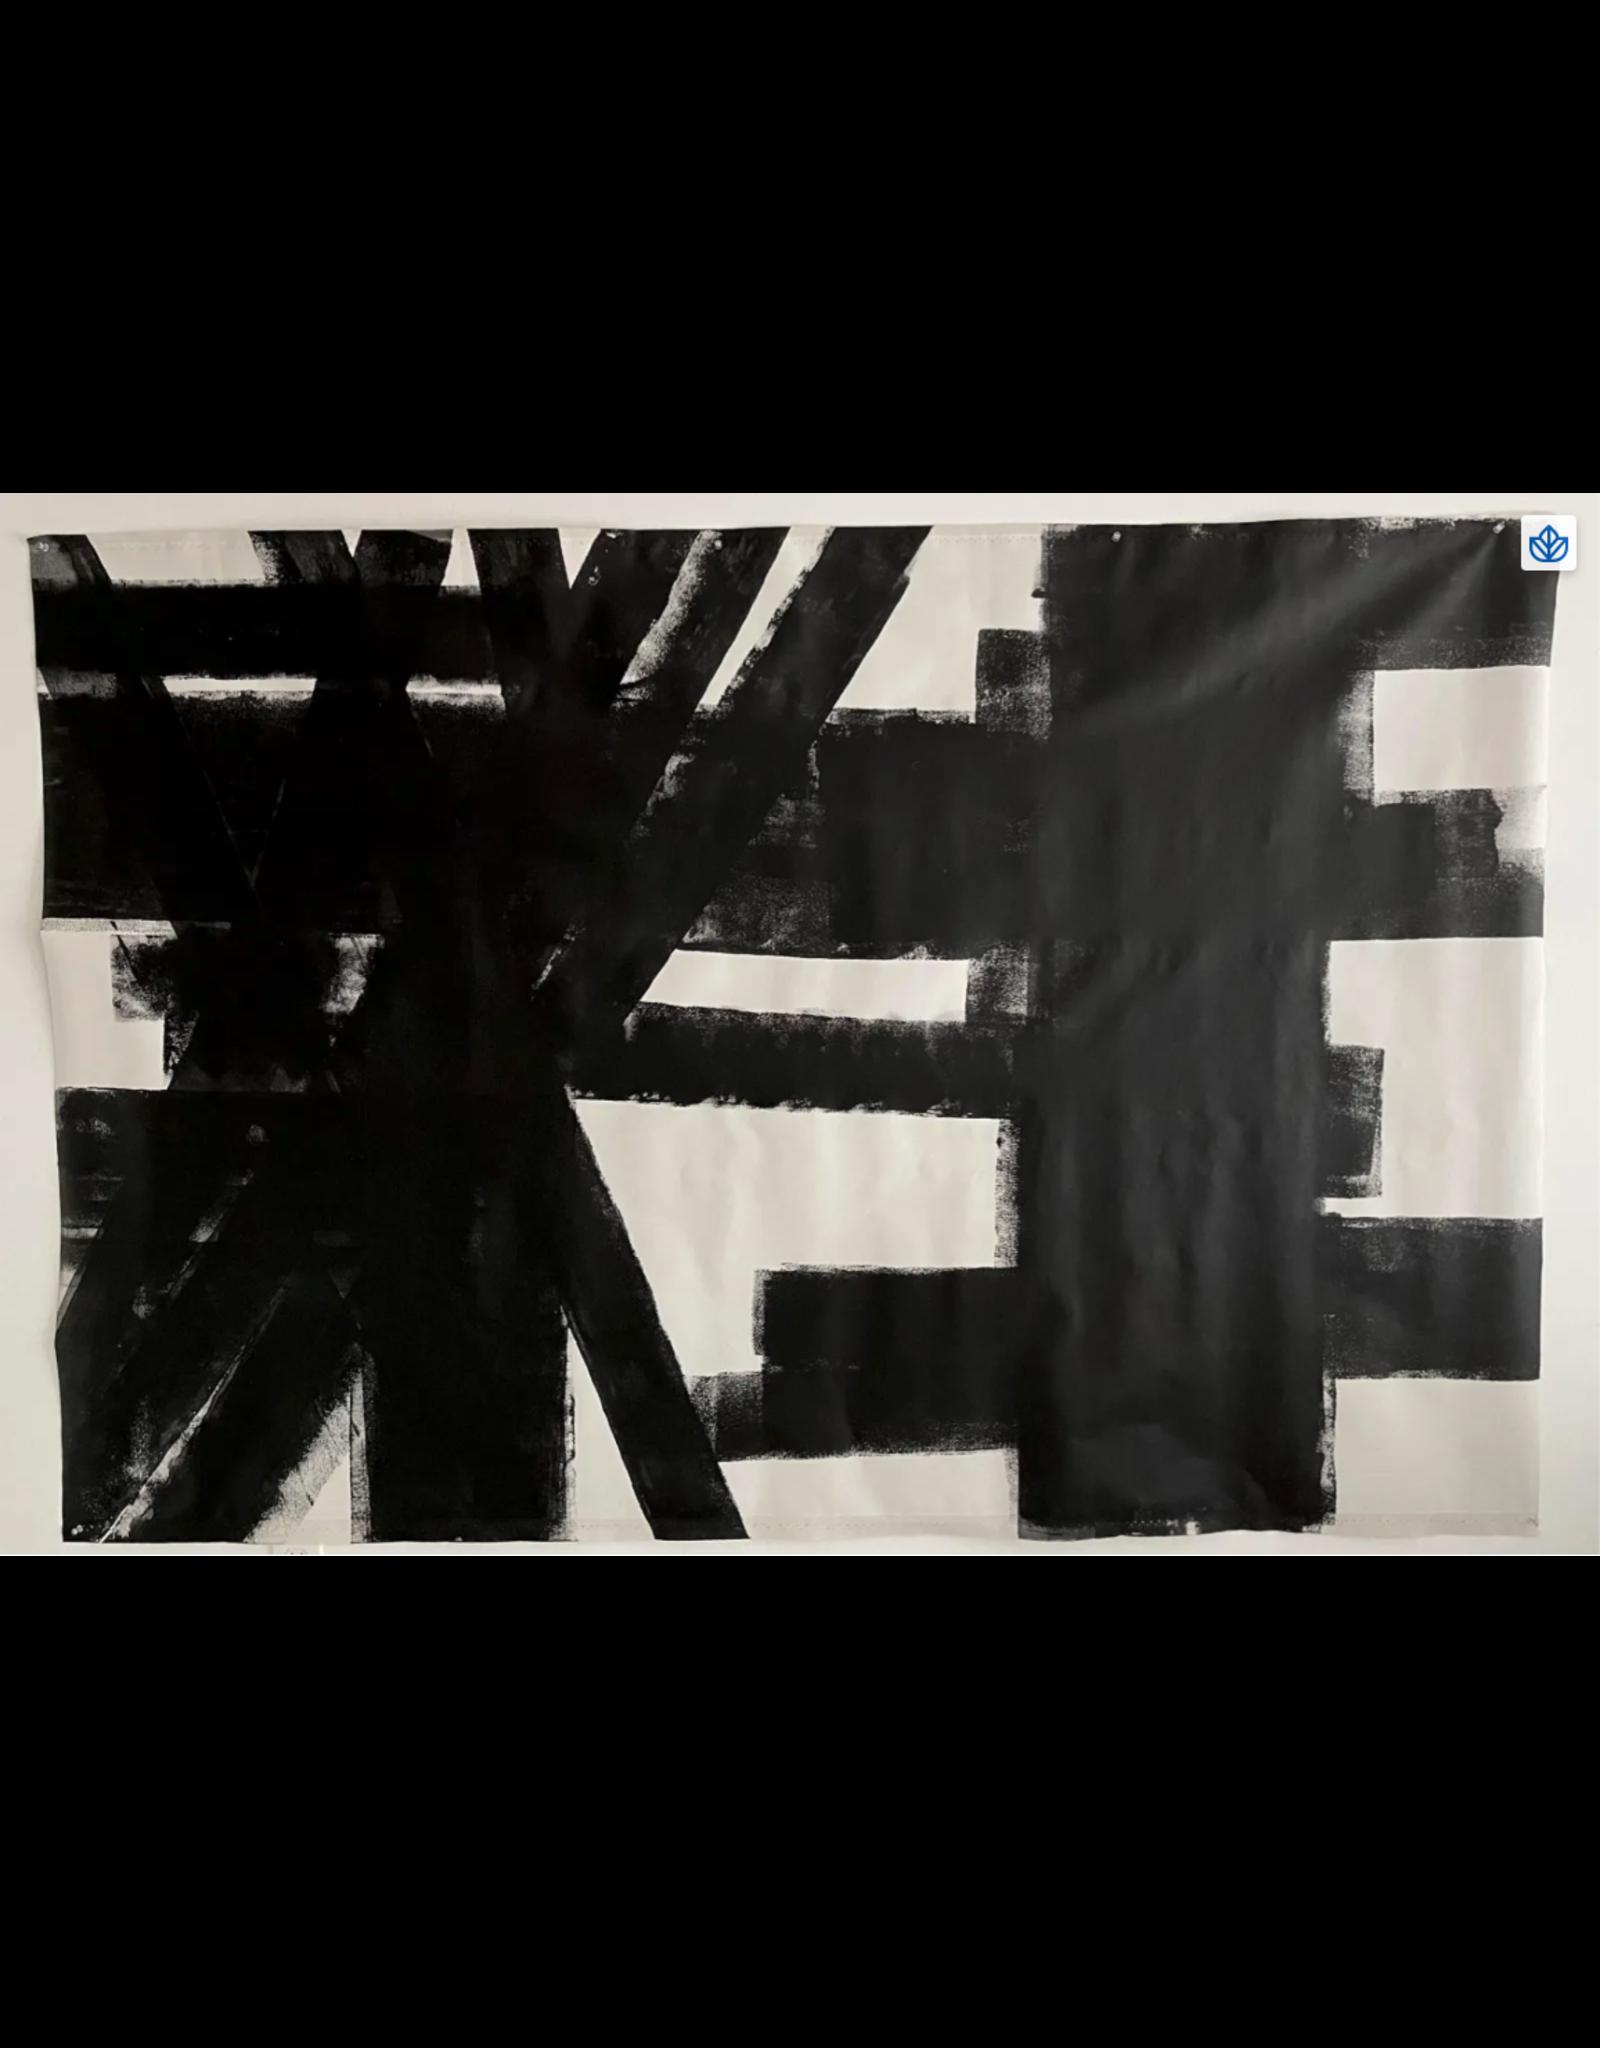 Abstract minimalist - acrylic on canvas #5